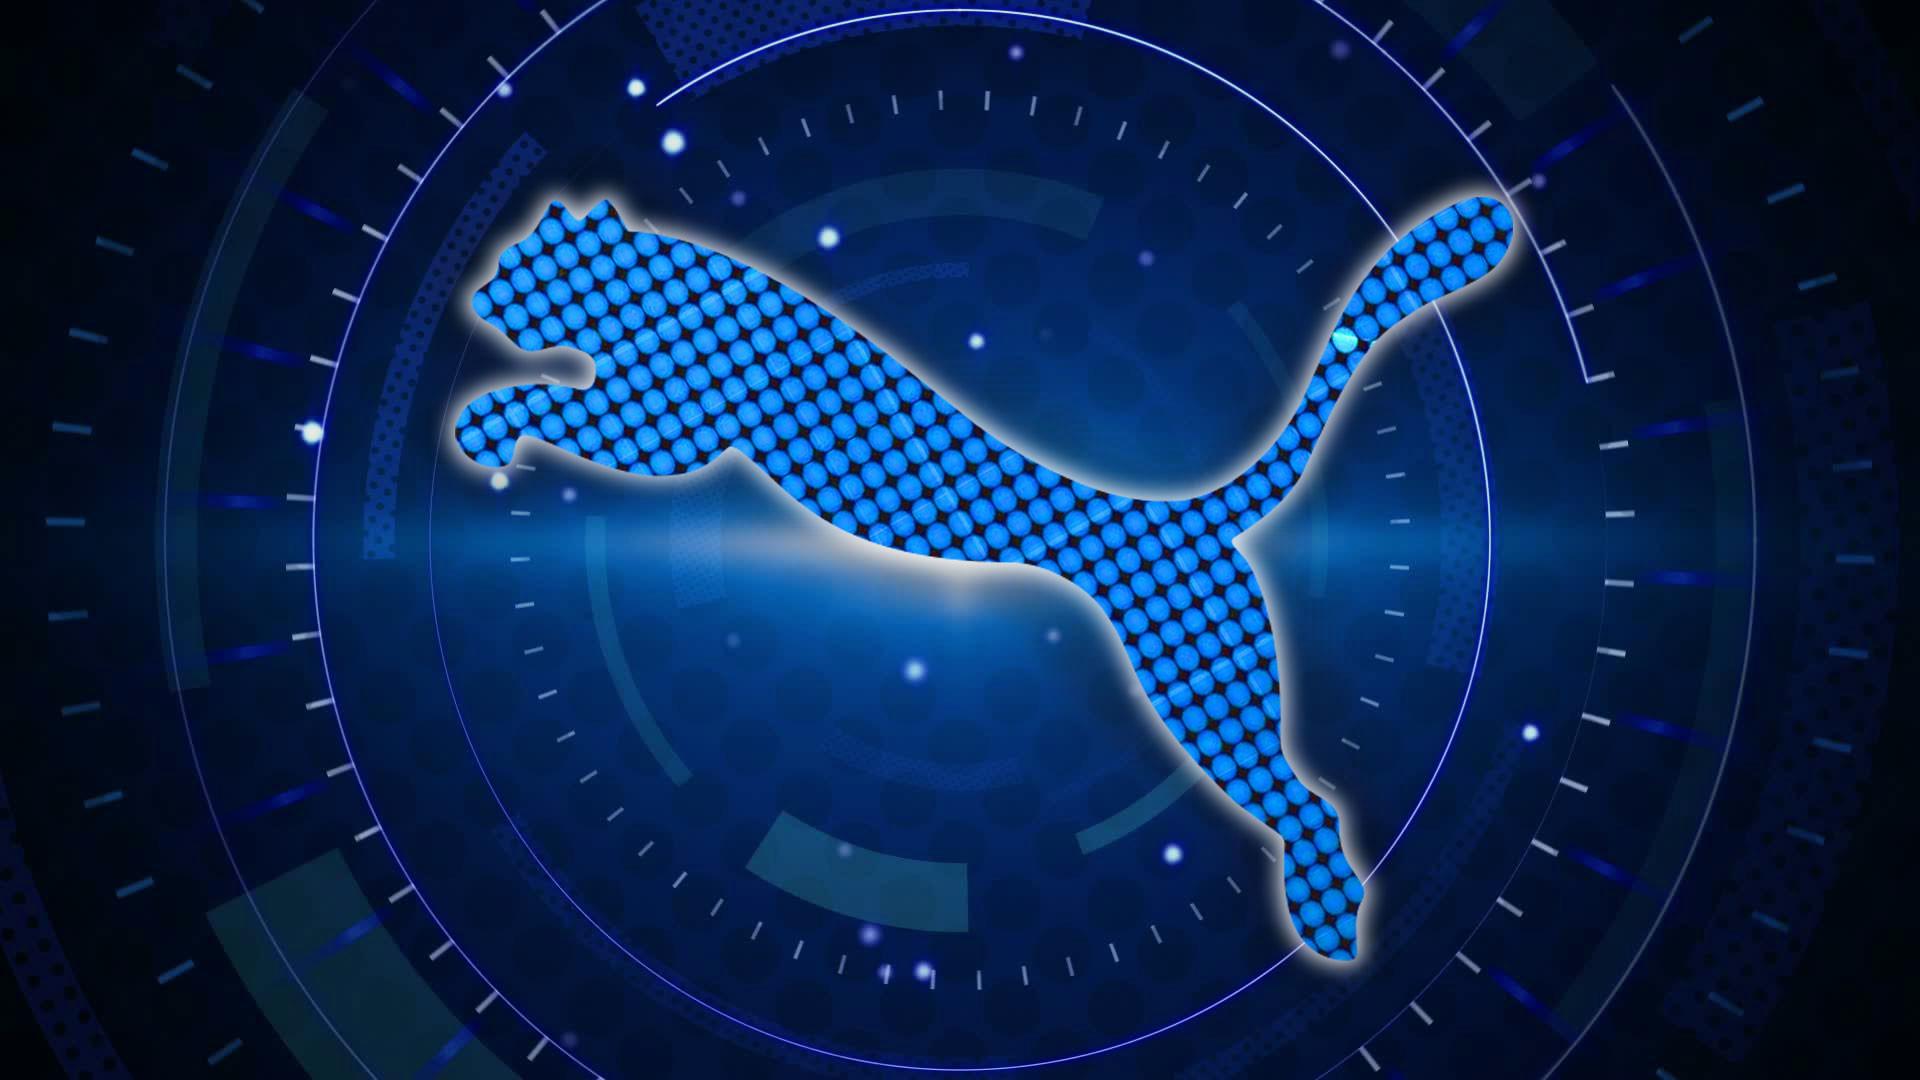 hd pics photos new attractive puma logo digital technology blue hd quality  desktop background wallpaper